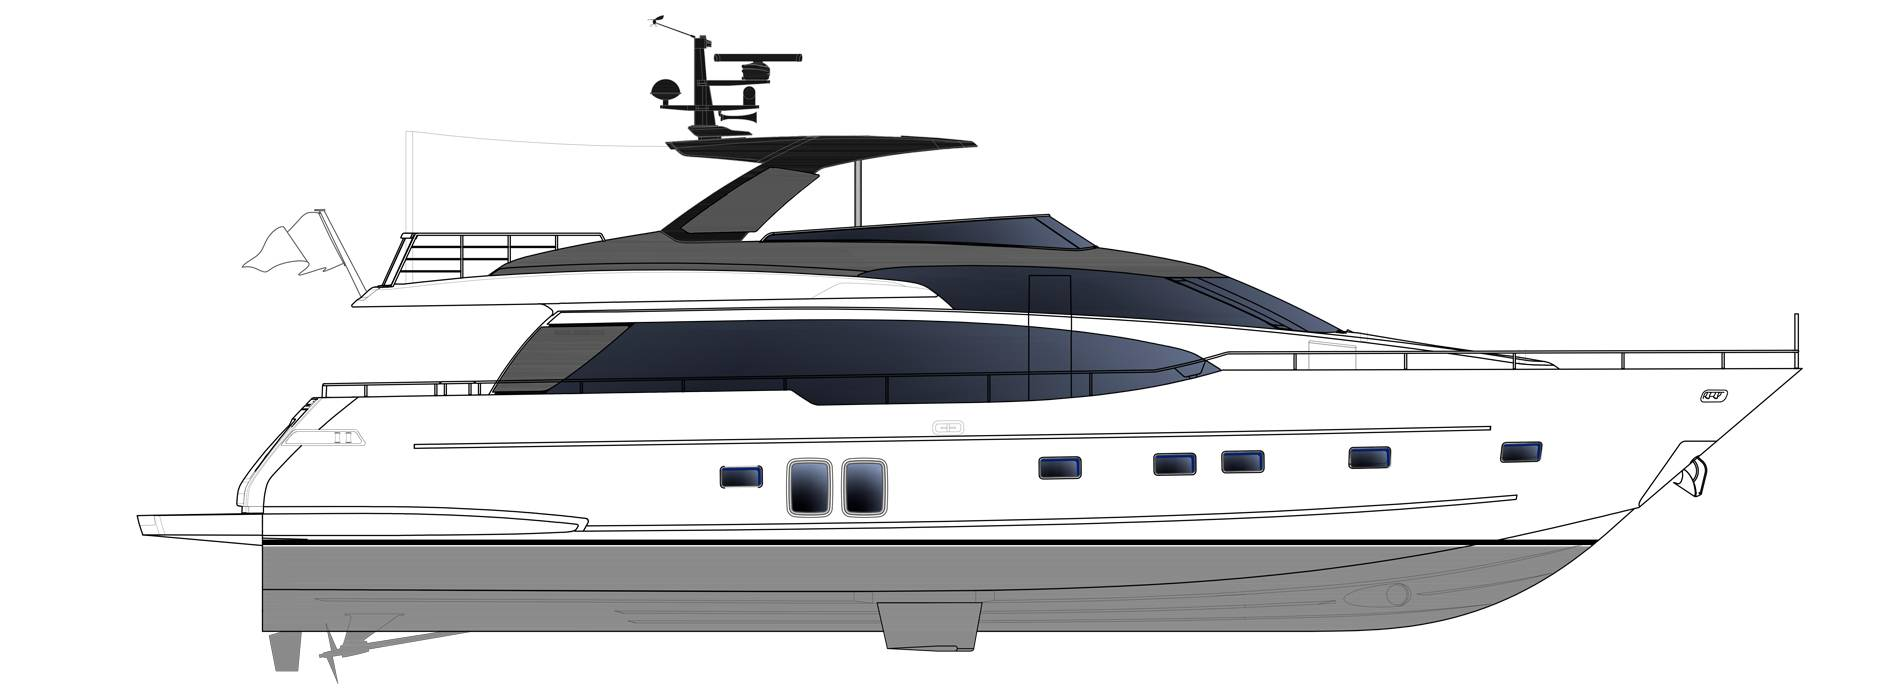 Sanlorenzo Yachts SL78-695 under offer Profile